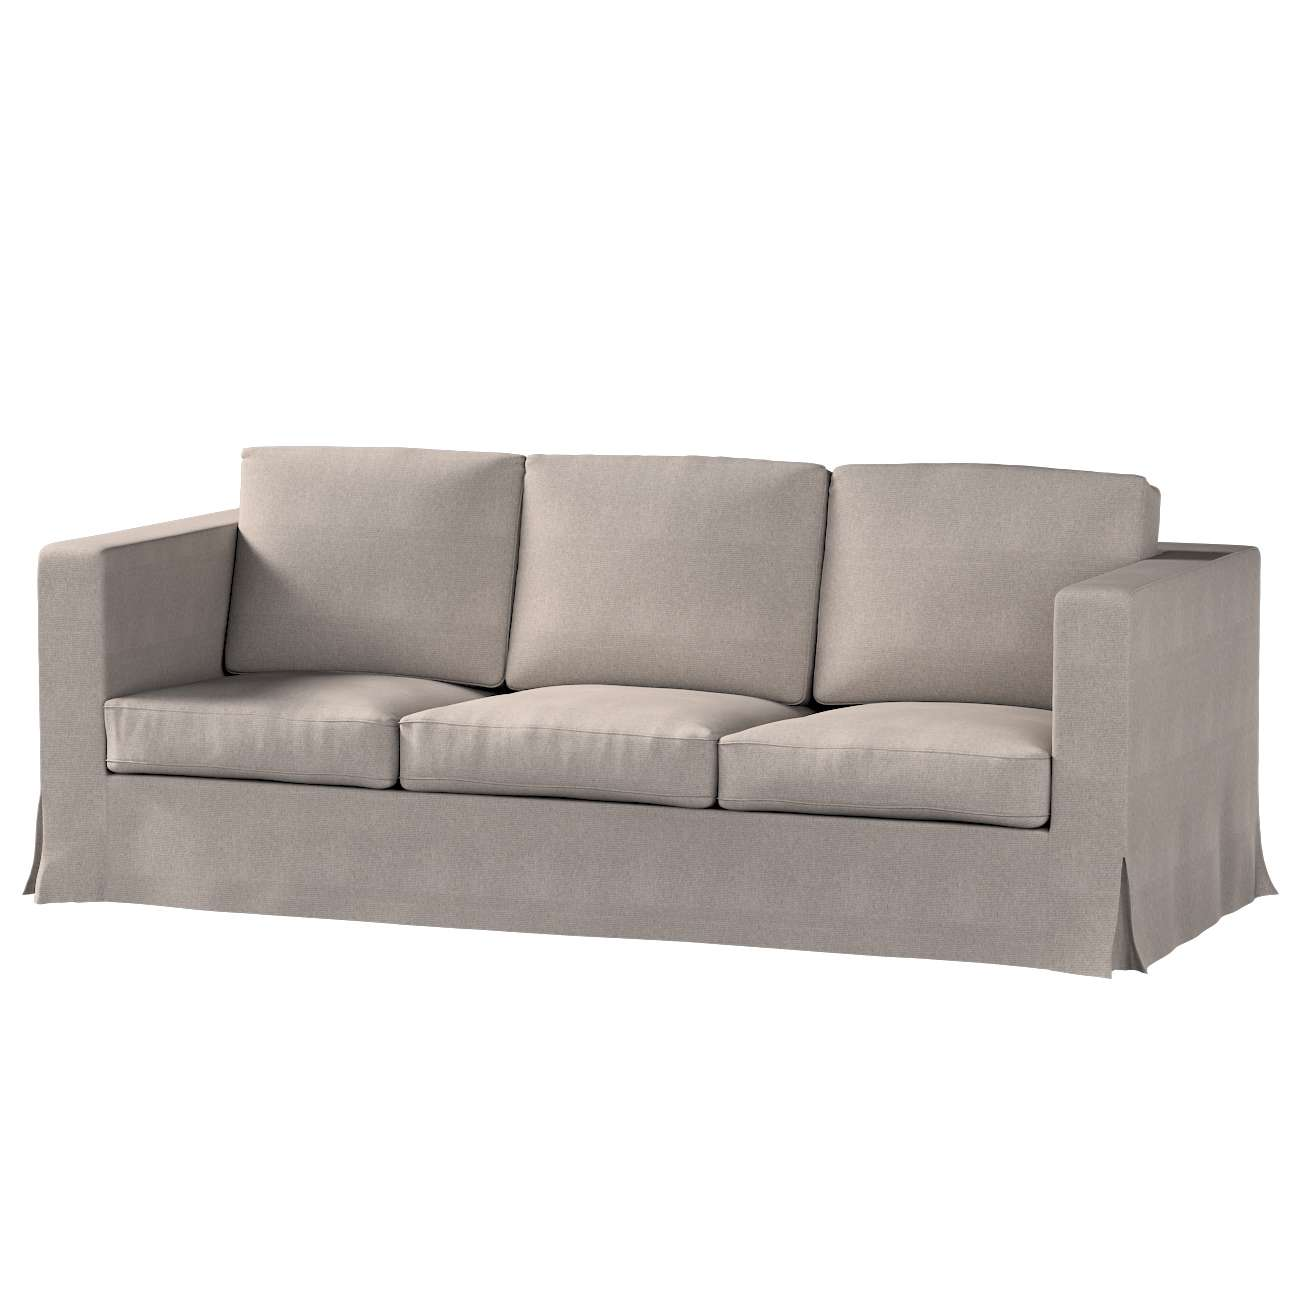 Karlanda 3-Sitzer  Sofabezug nicht ausklappbar lang Sofa Karlanda 3-lang von der Kollektion Etna, Stoff: 705-09